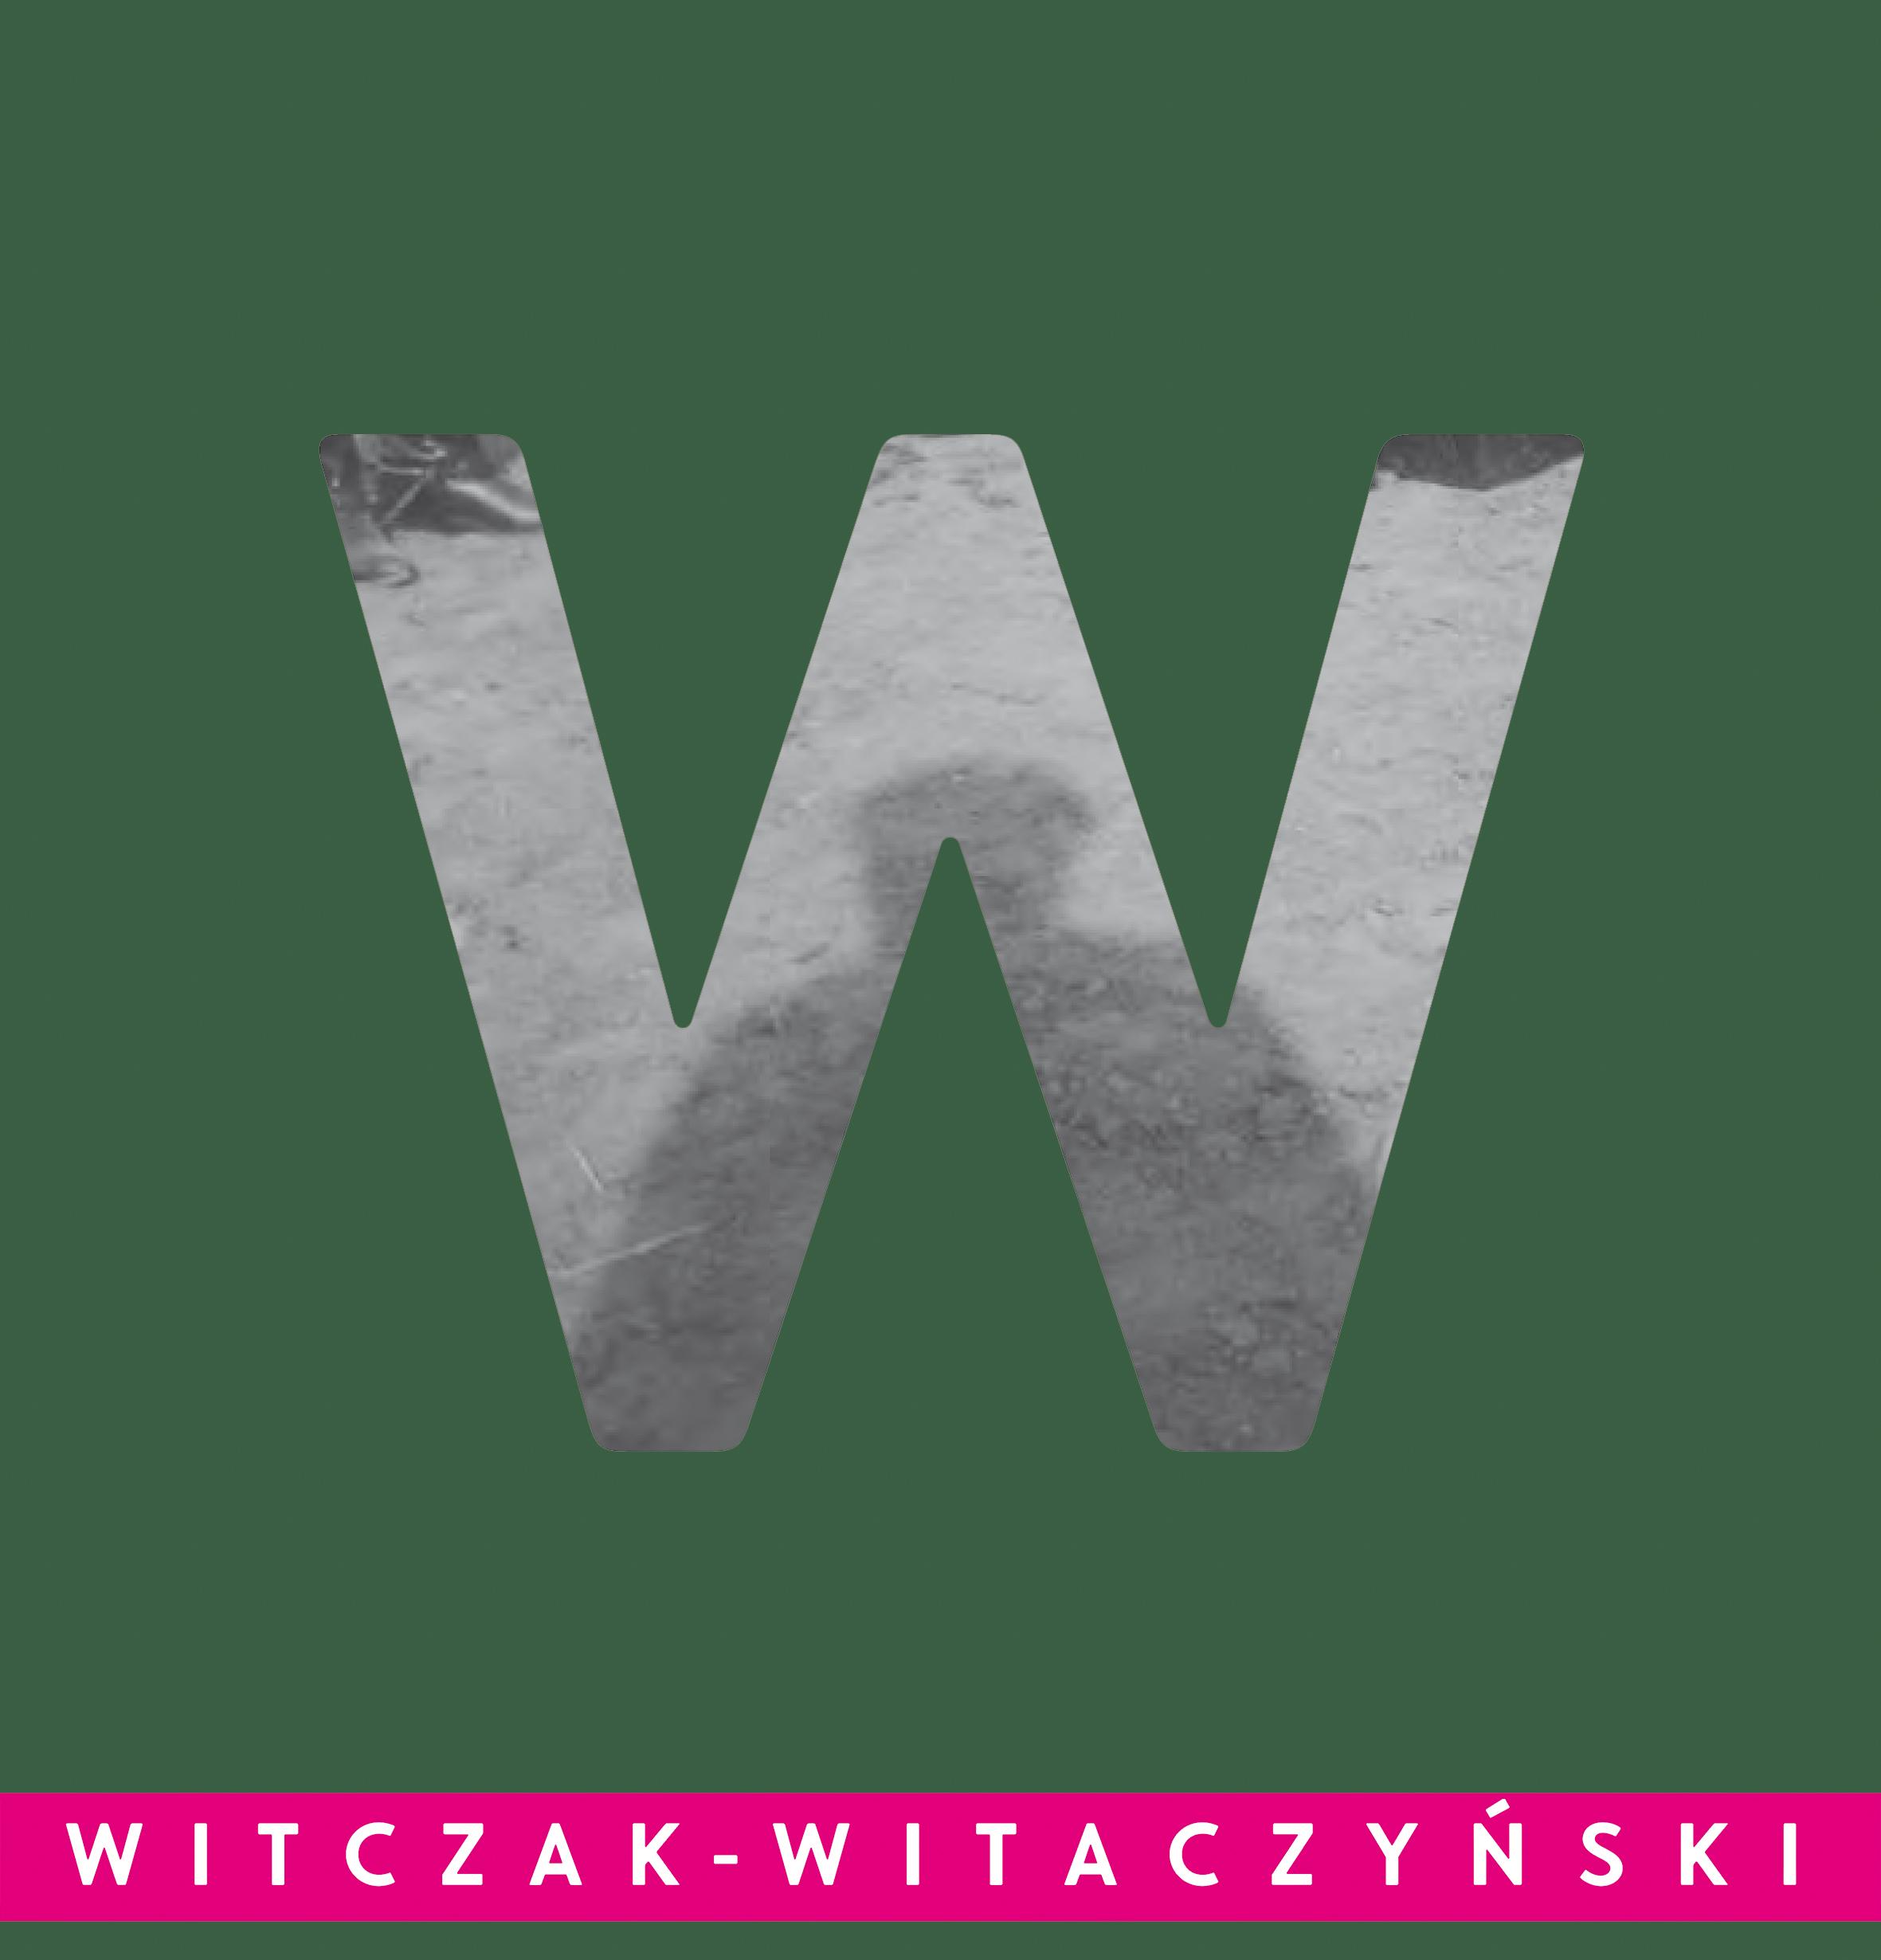 https://www.nac.gov.pl/wp-content/uploads/2019/01/ok%C5%82adka3.jpg